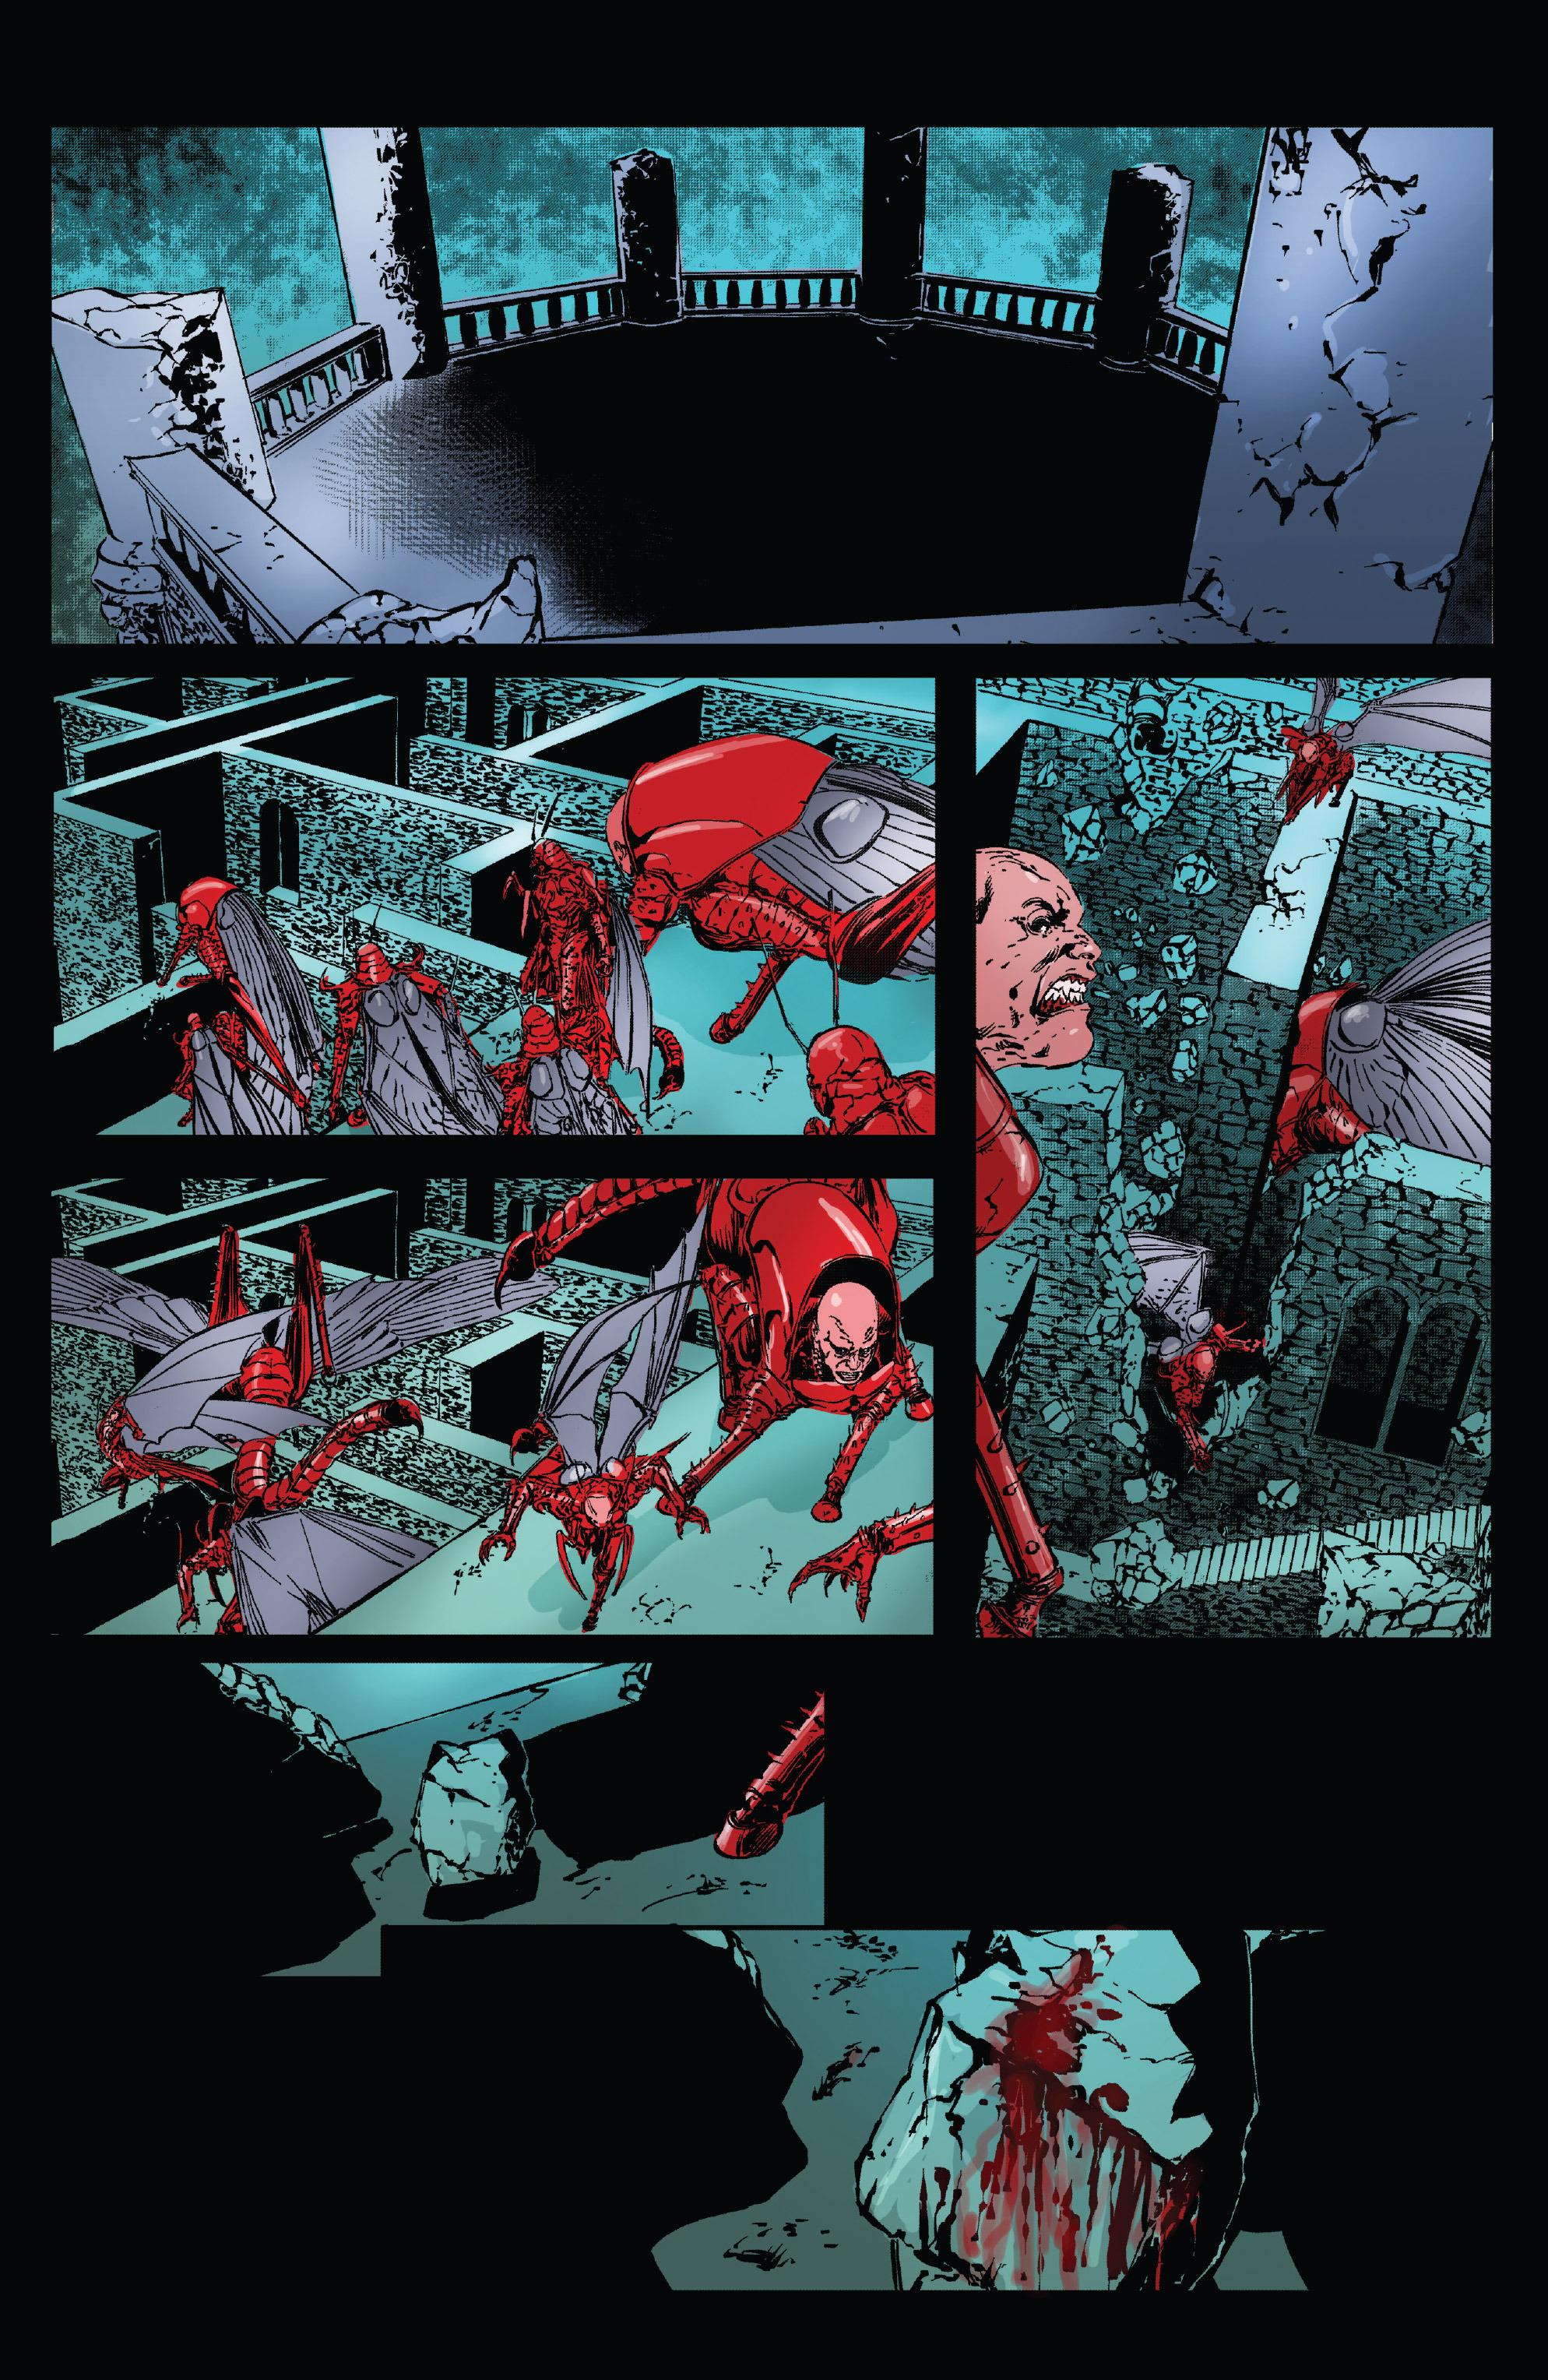 Read online Clive Barker's Hellraiser: The Dark Watch comic -  Issue # TPB 3 - 118